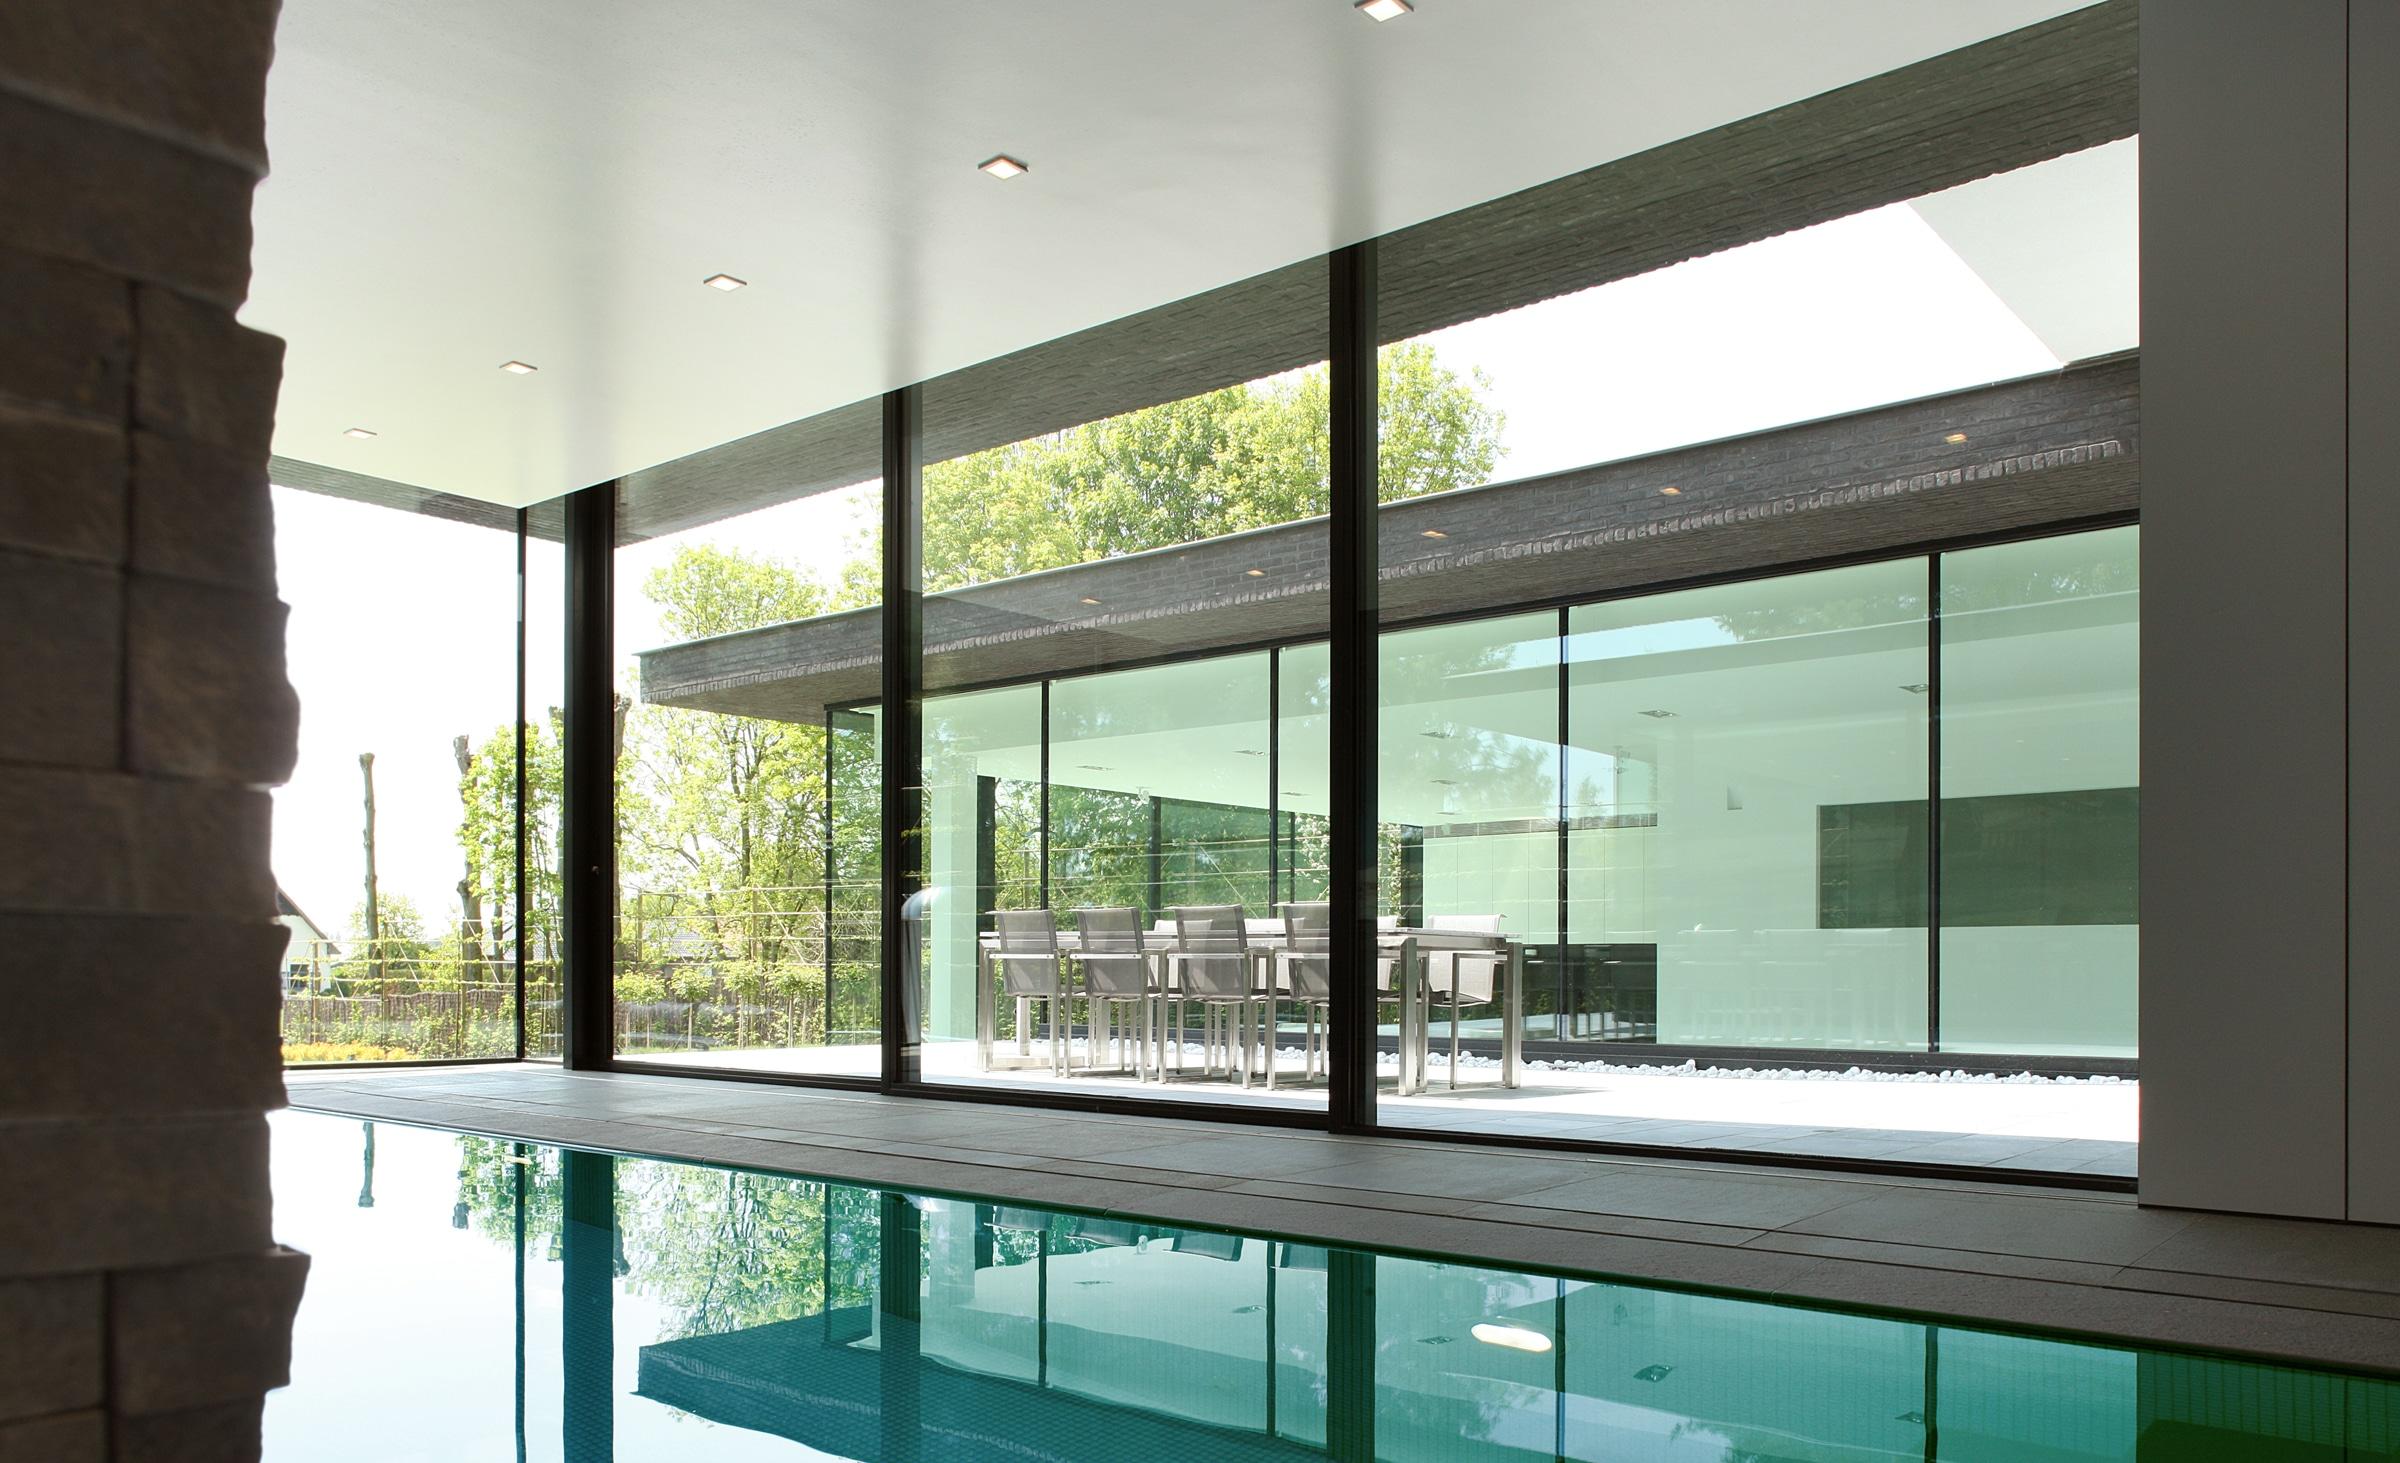 012 Lootens1 | Baeyens & Beck architecten Gent | architect nieuwbouw renovatie interieur | high end | architectenbureau